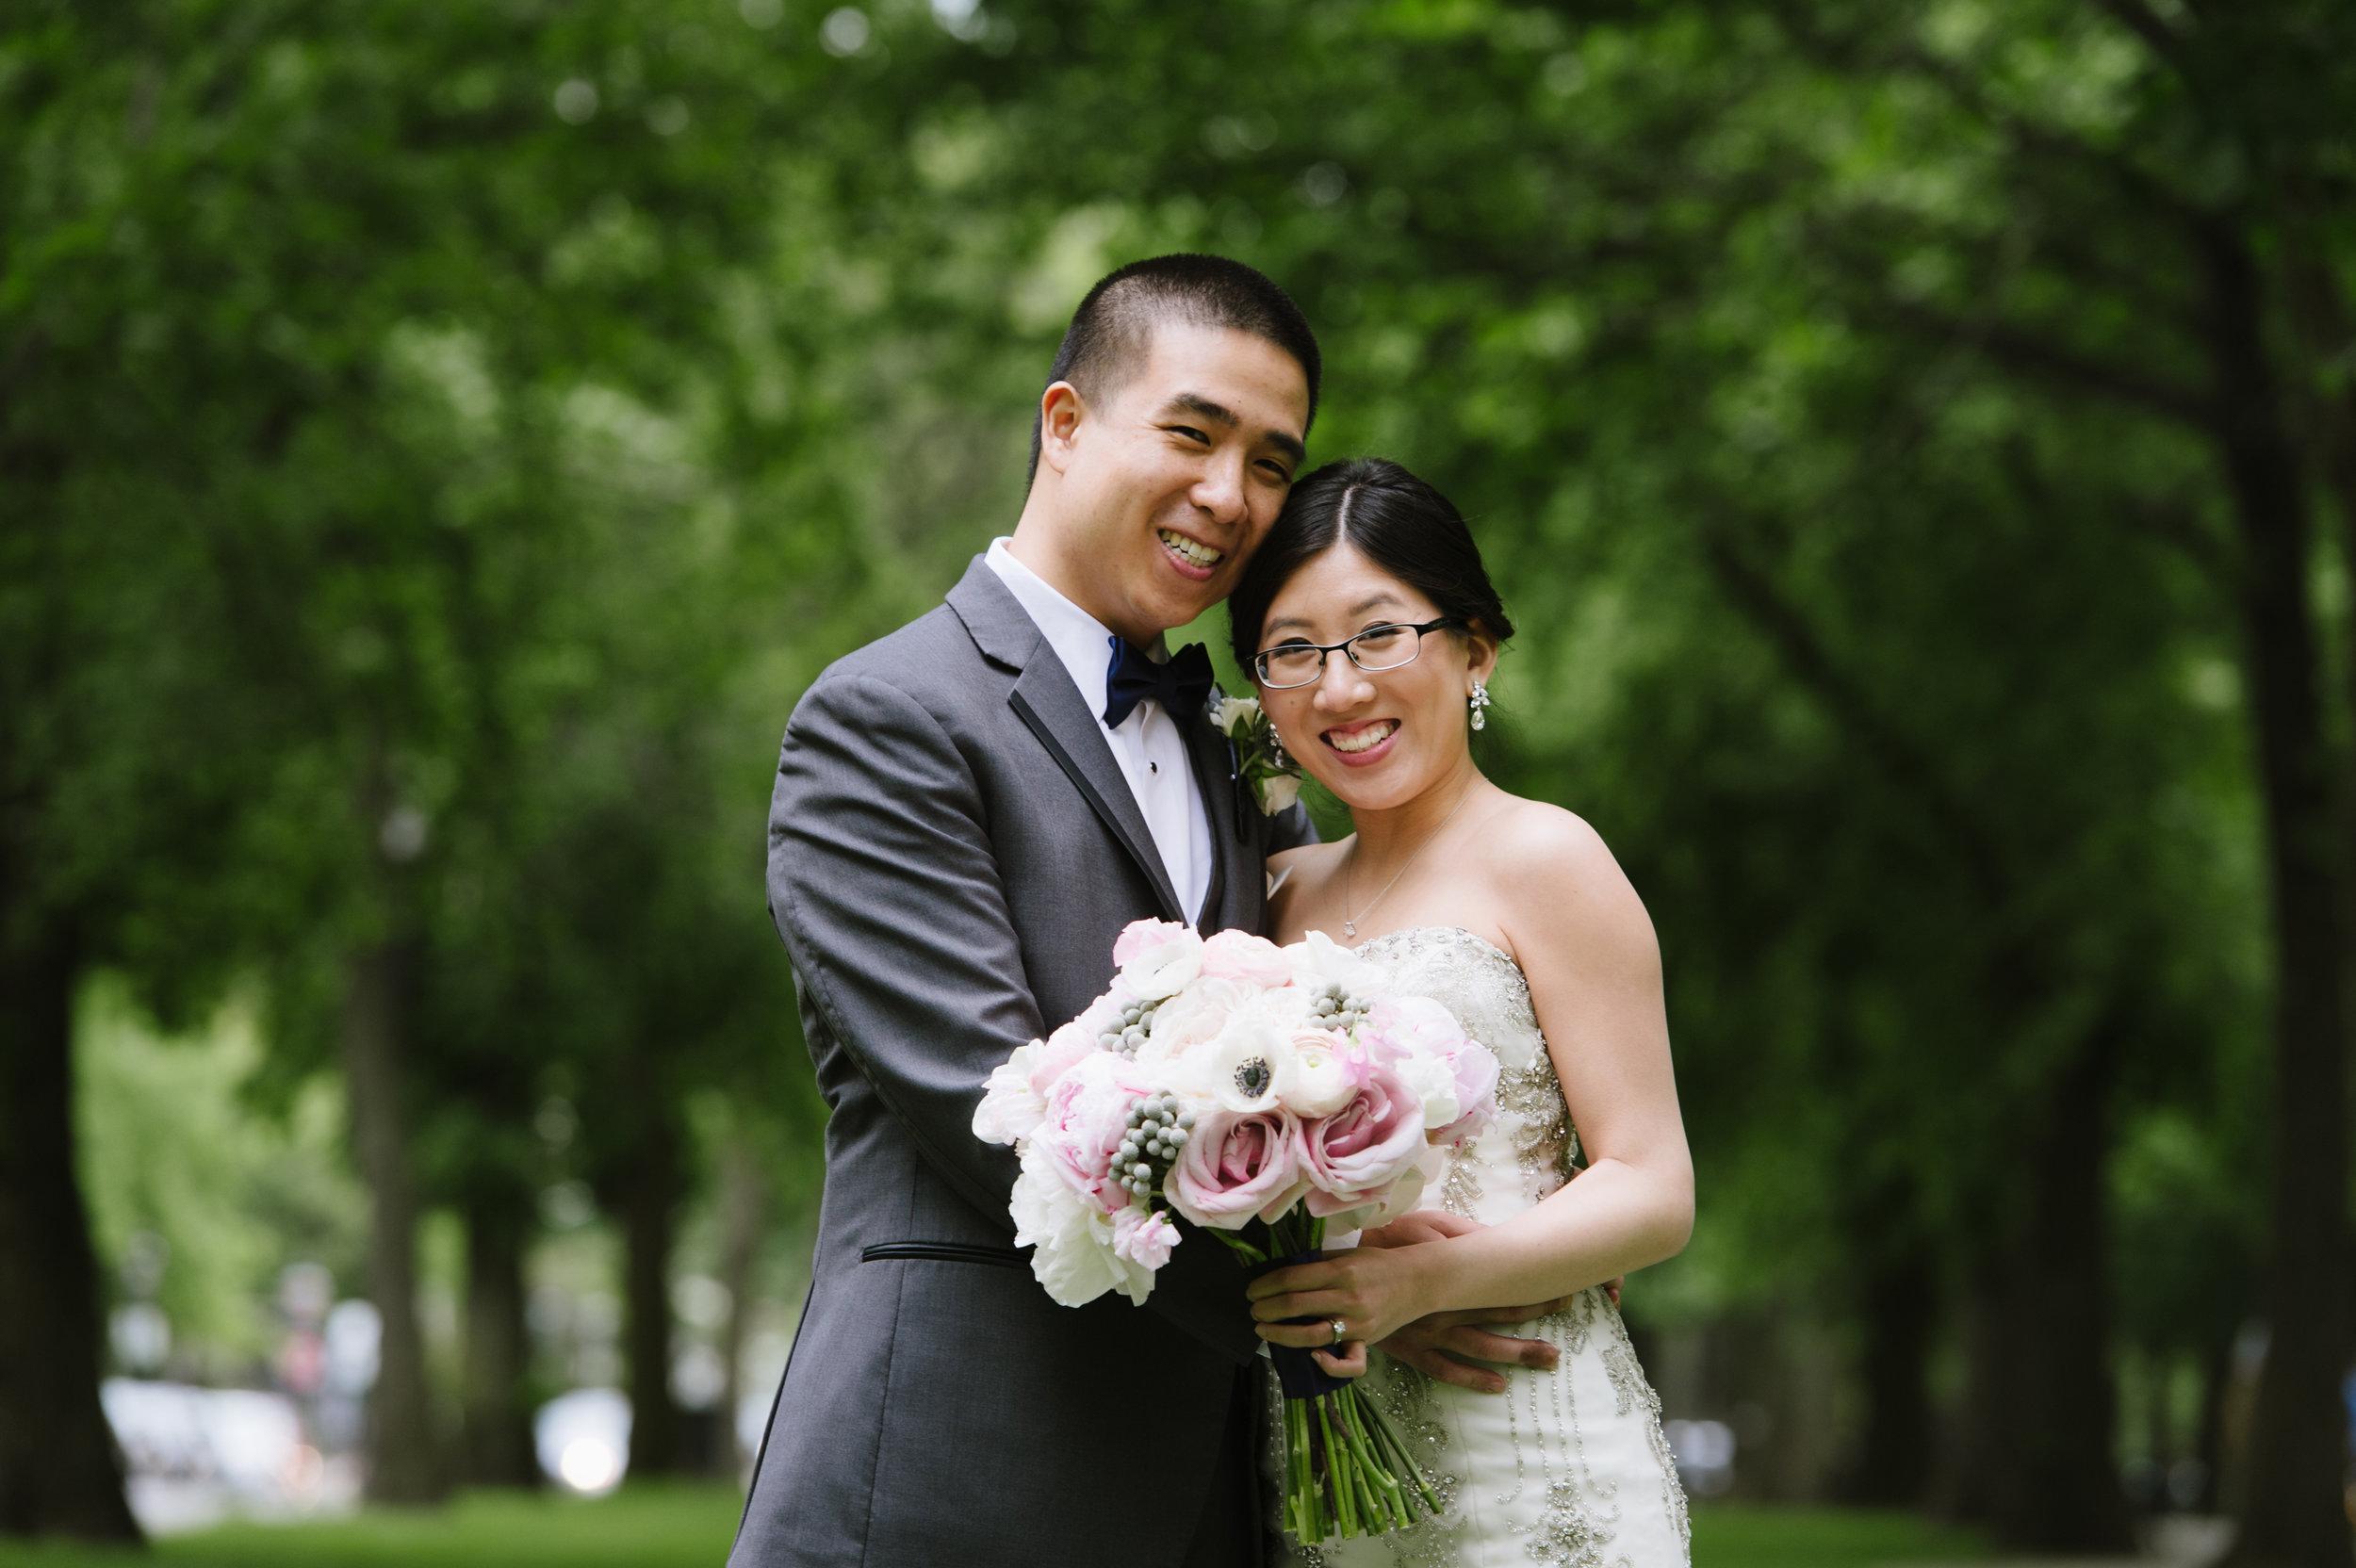 Fairmont-Copley-Wedding-Boston004.jpg